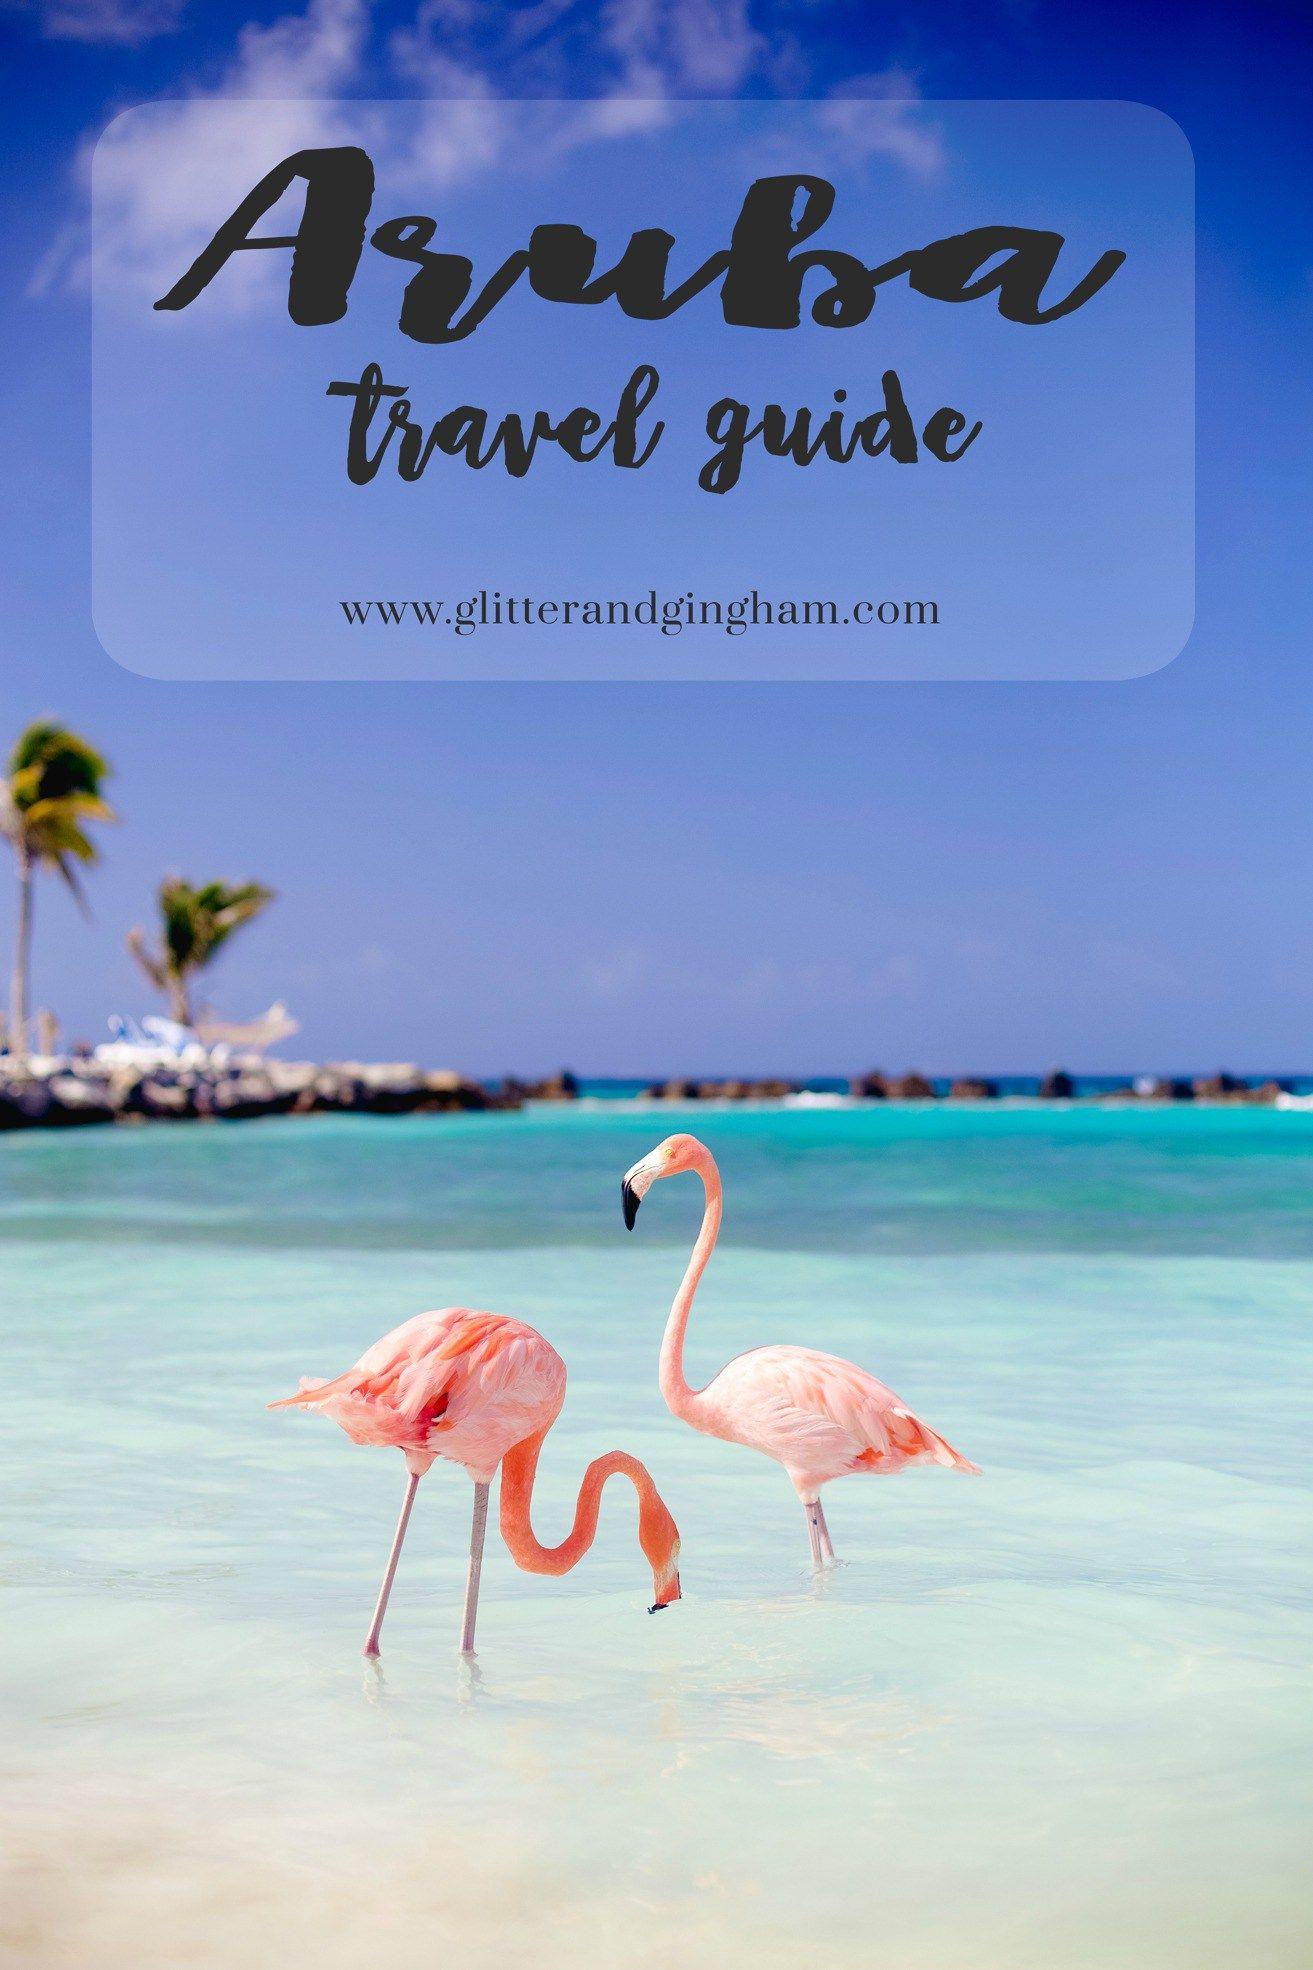 Caribbean Aruba Travel Guide Aruba tours